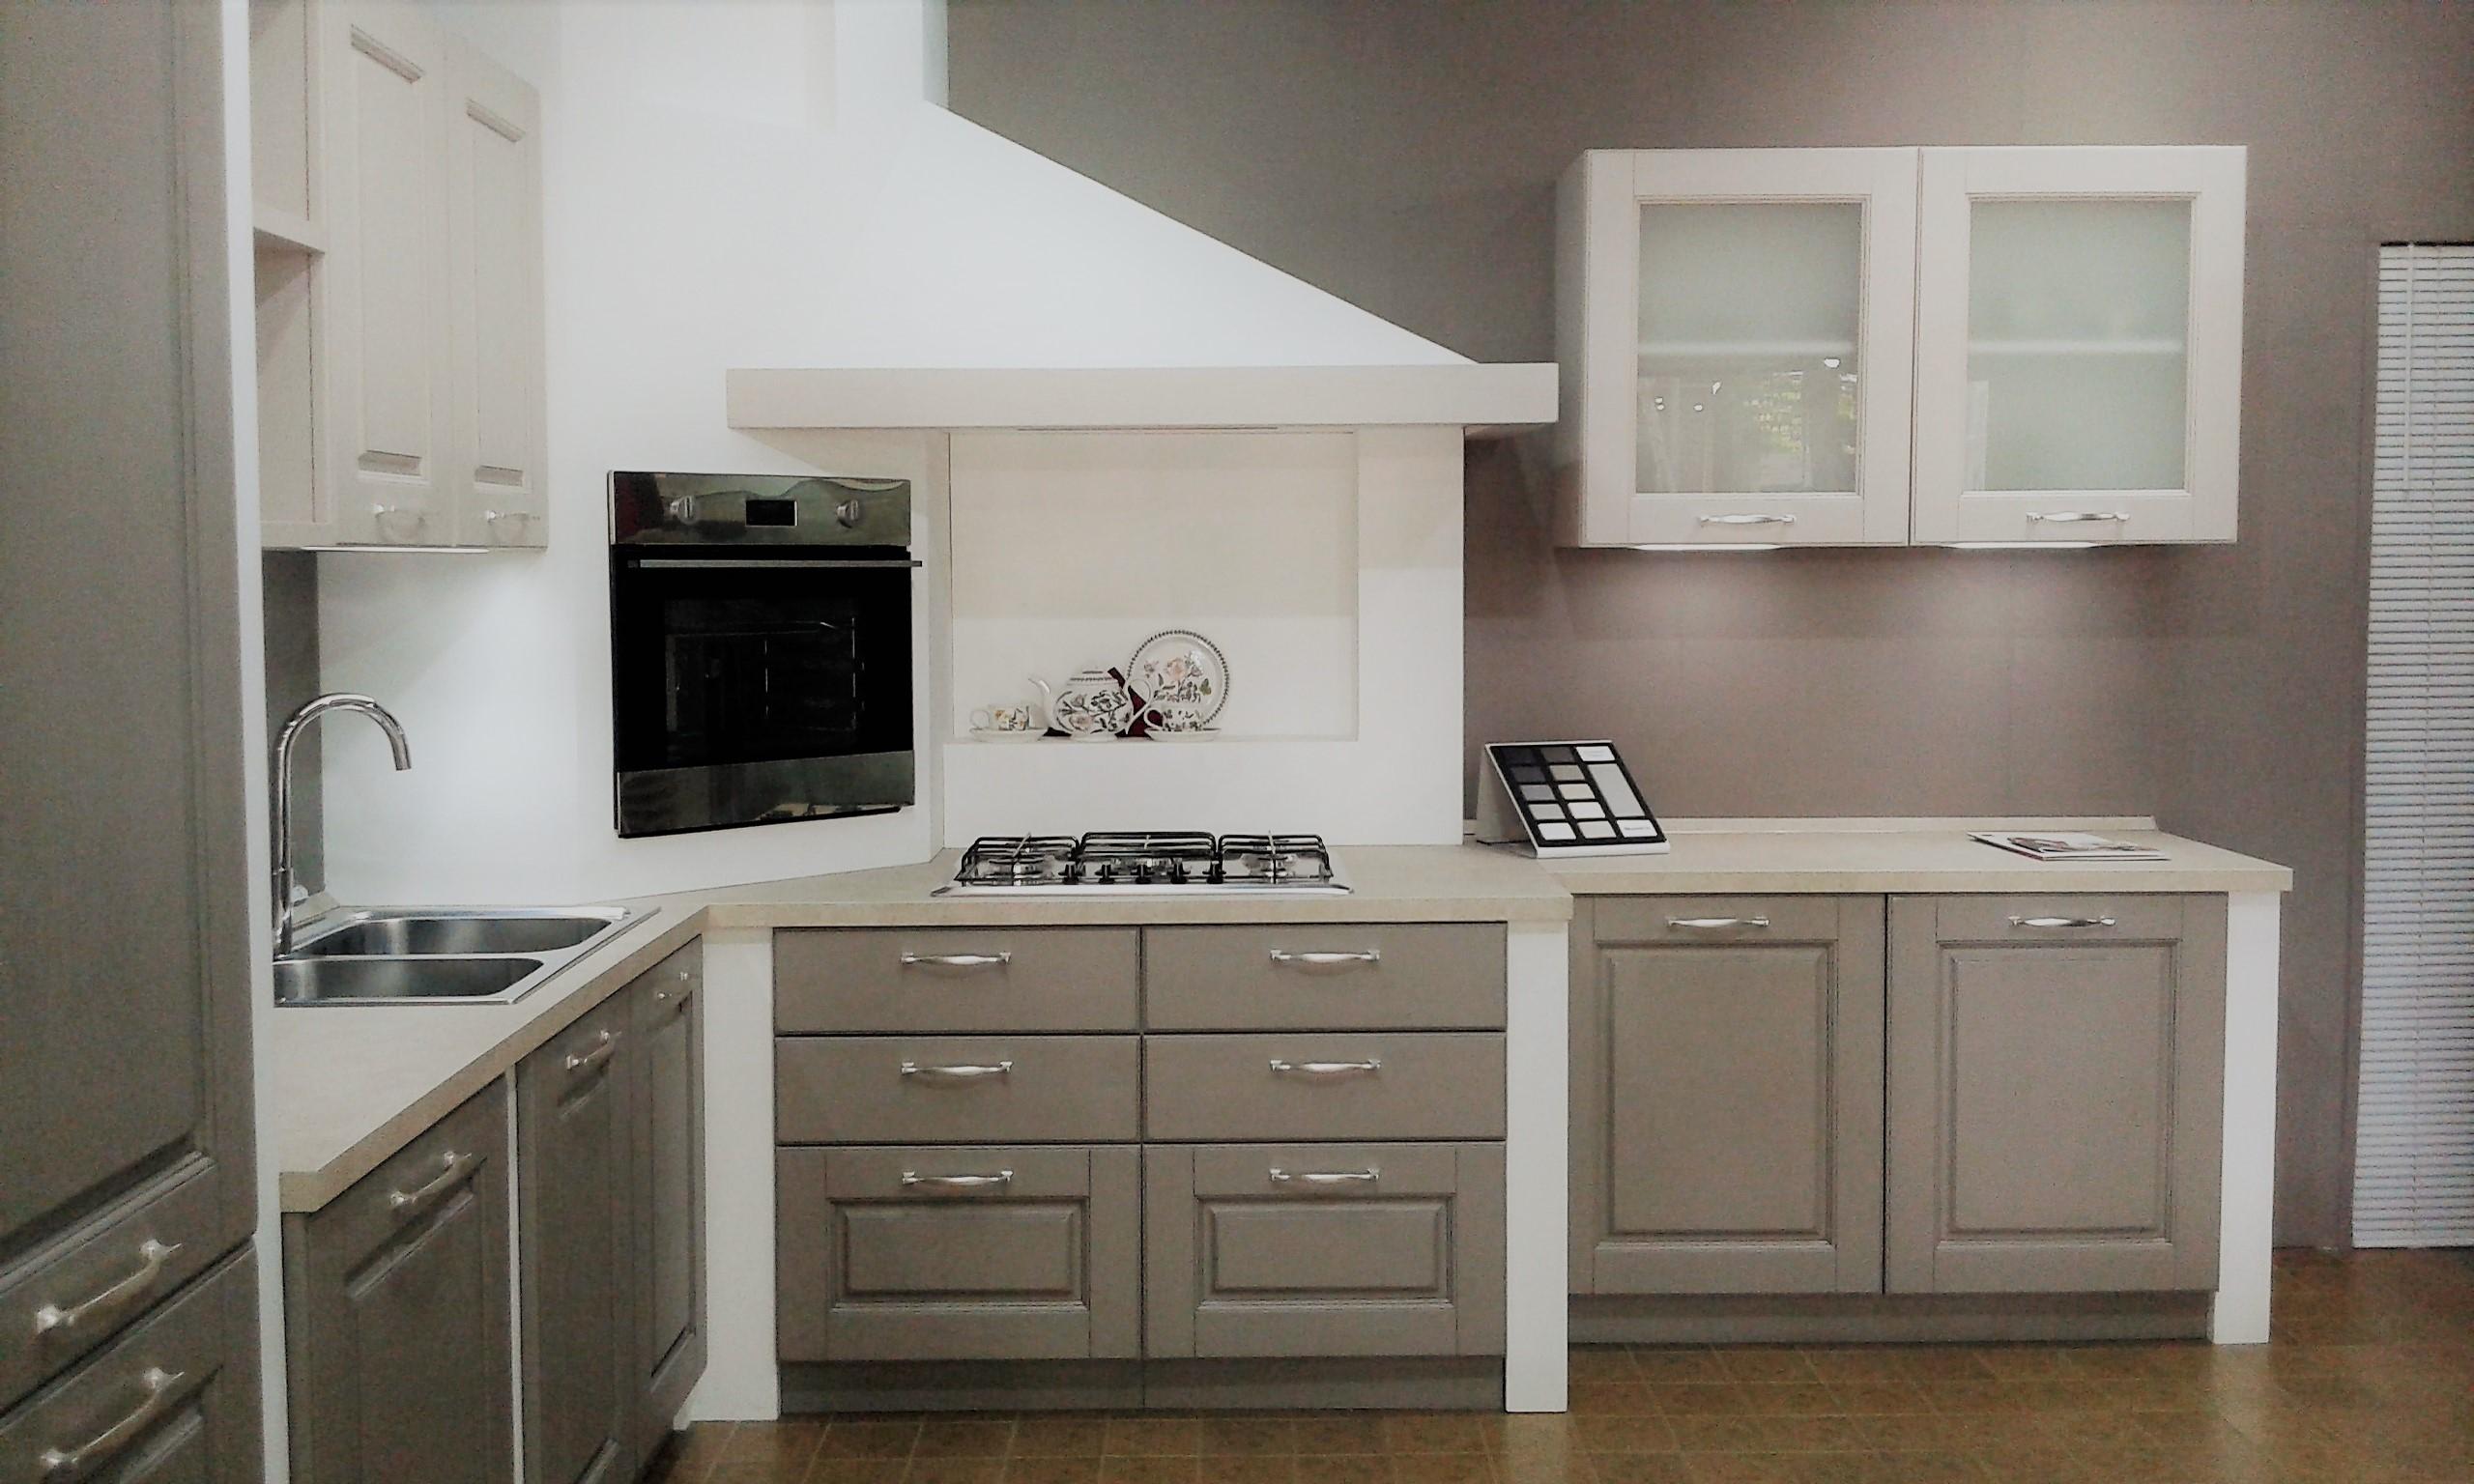 Emejing Angolo Cucina In Muratura Gallery - Home Interior Ideas ...